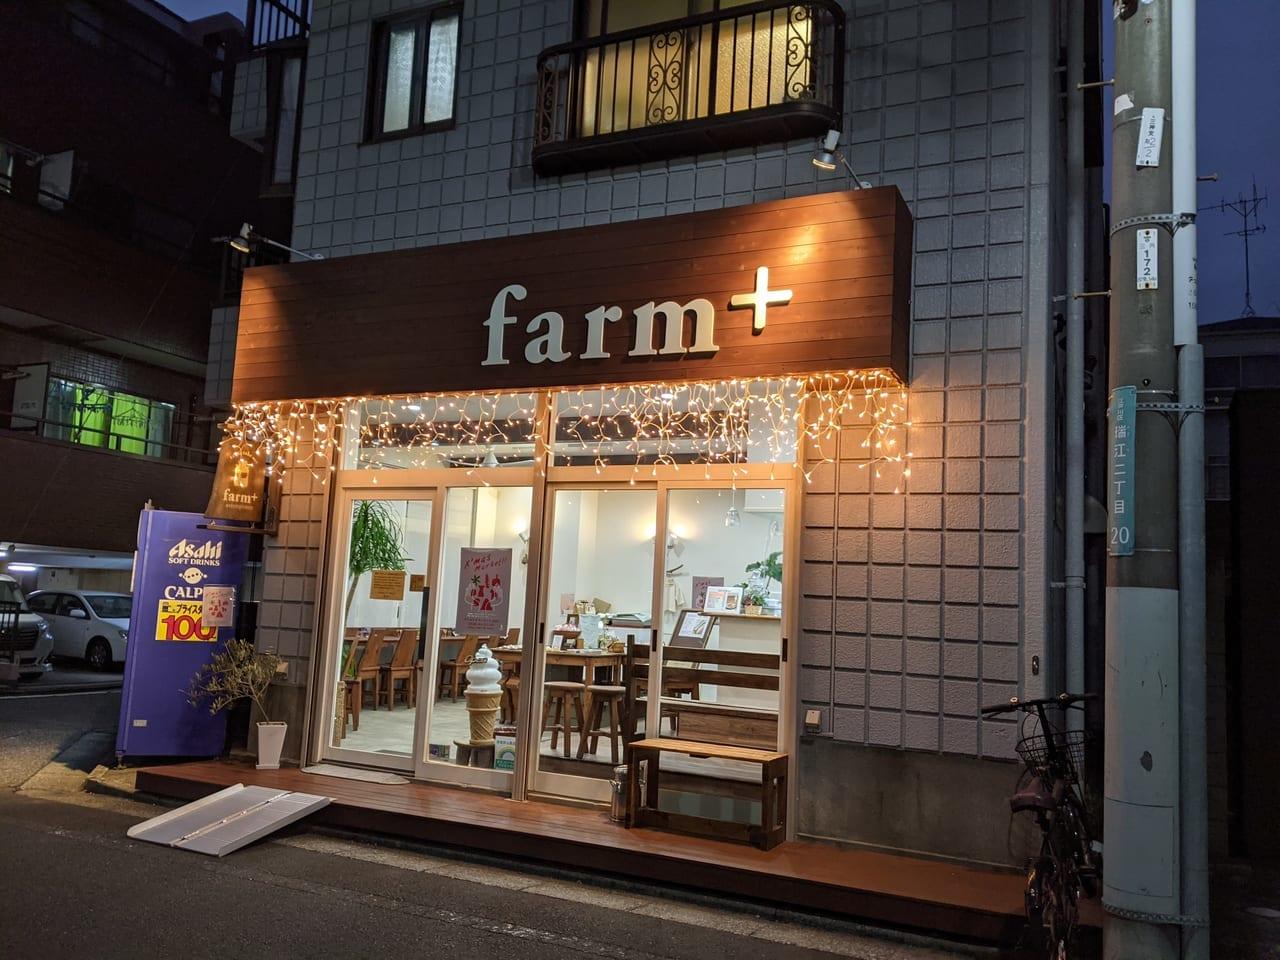 『farm+』(ファームプラス)外観